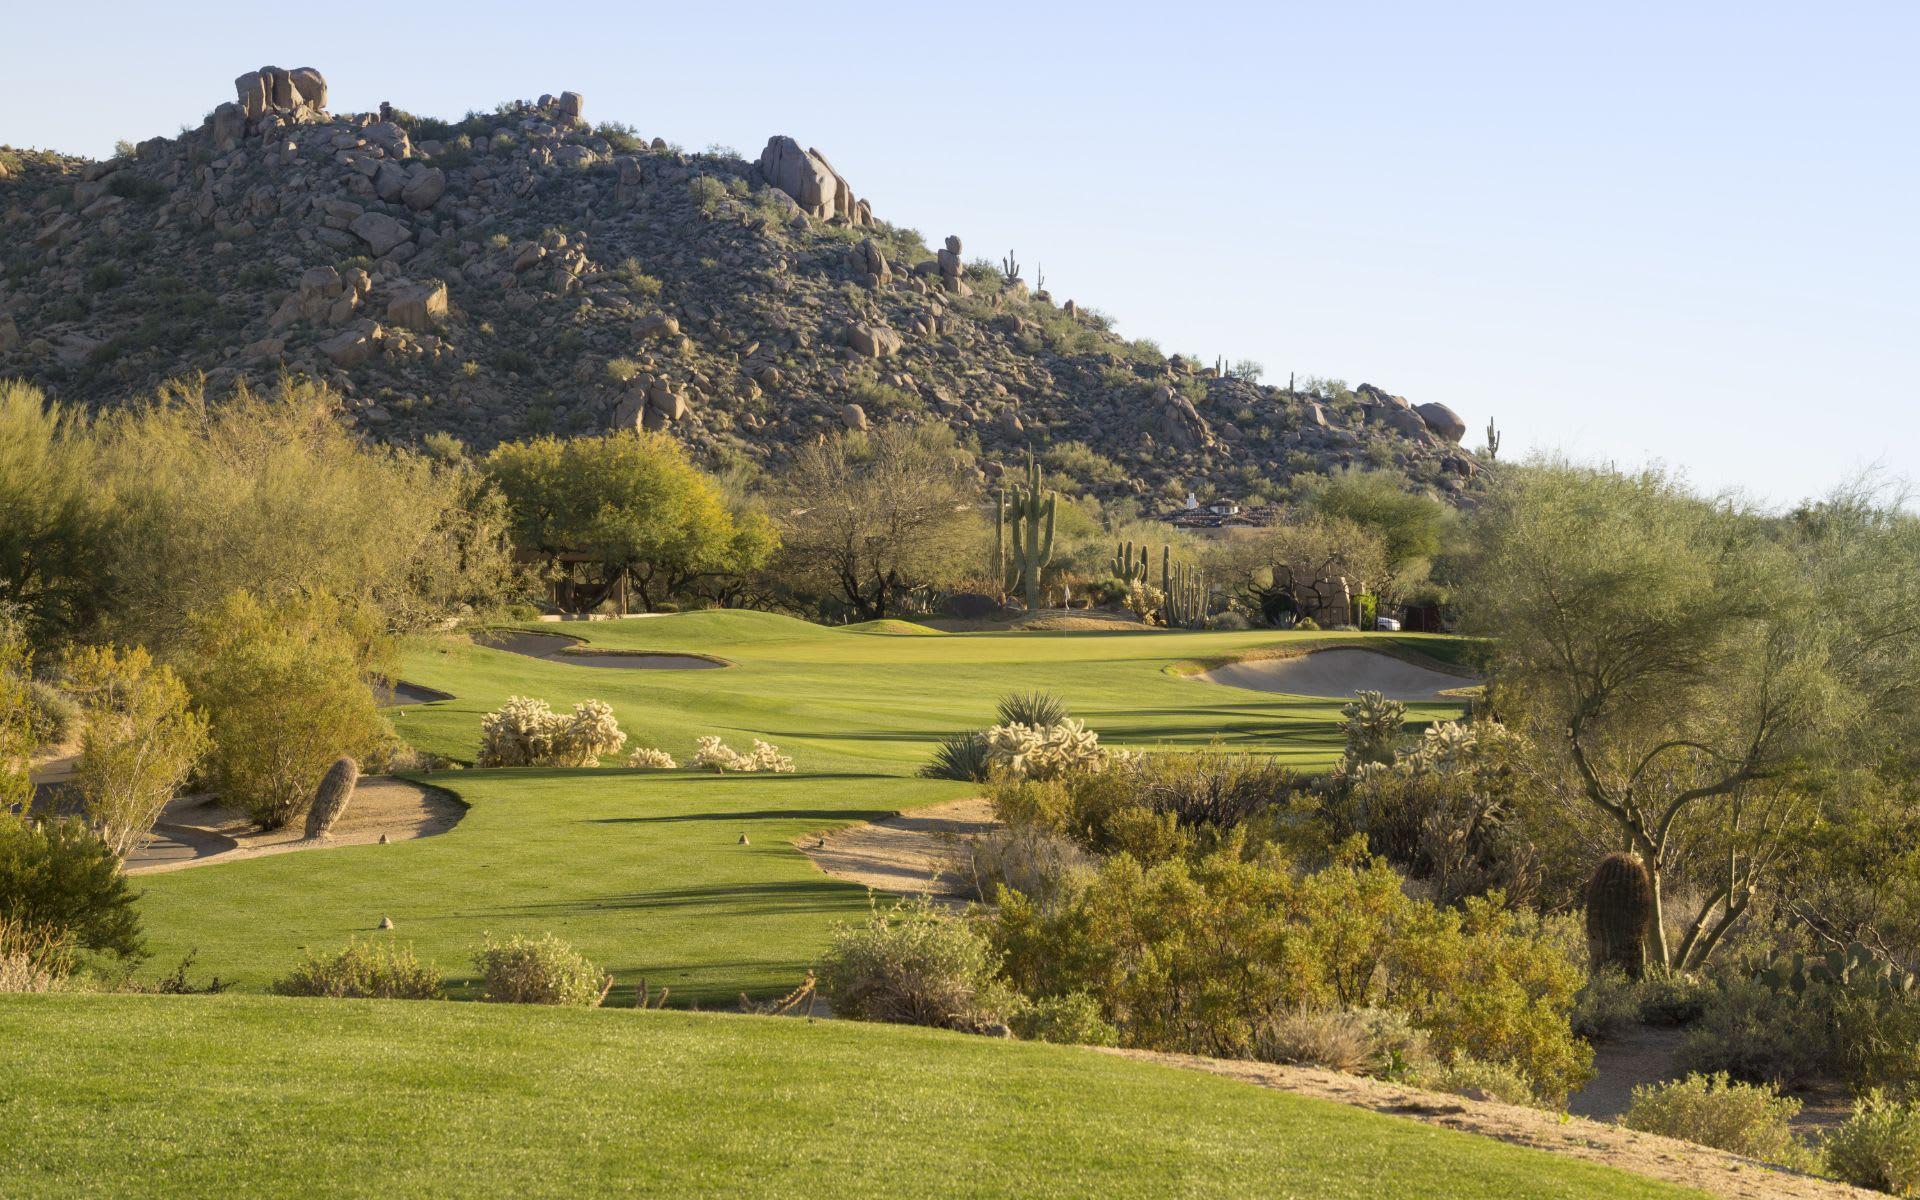 5 Best Golf Courses in Tucson